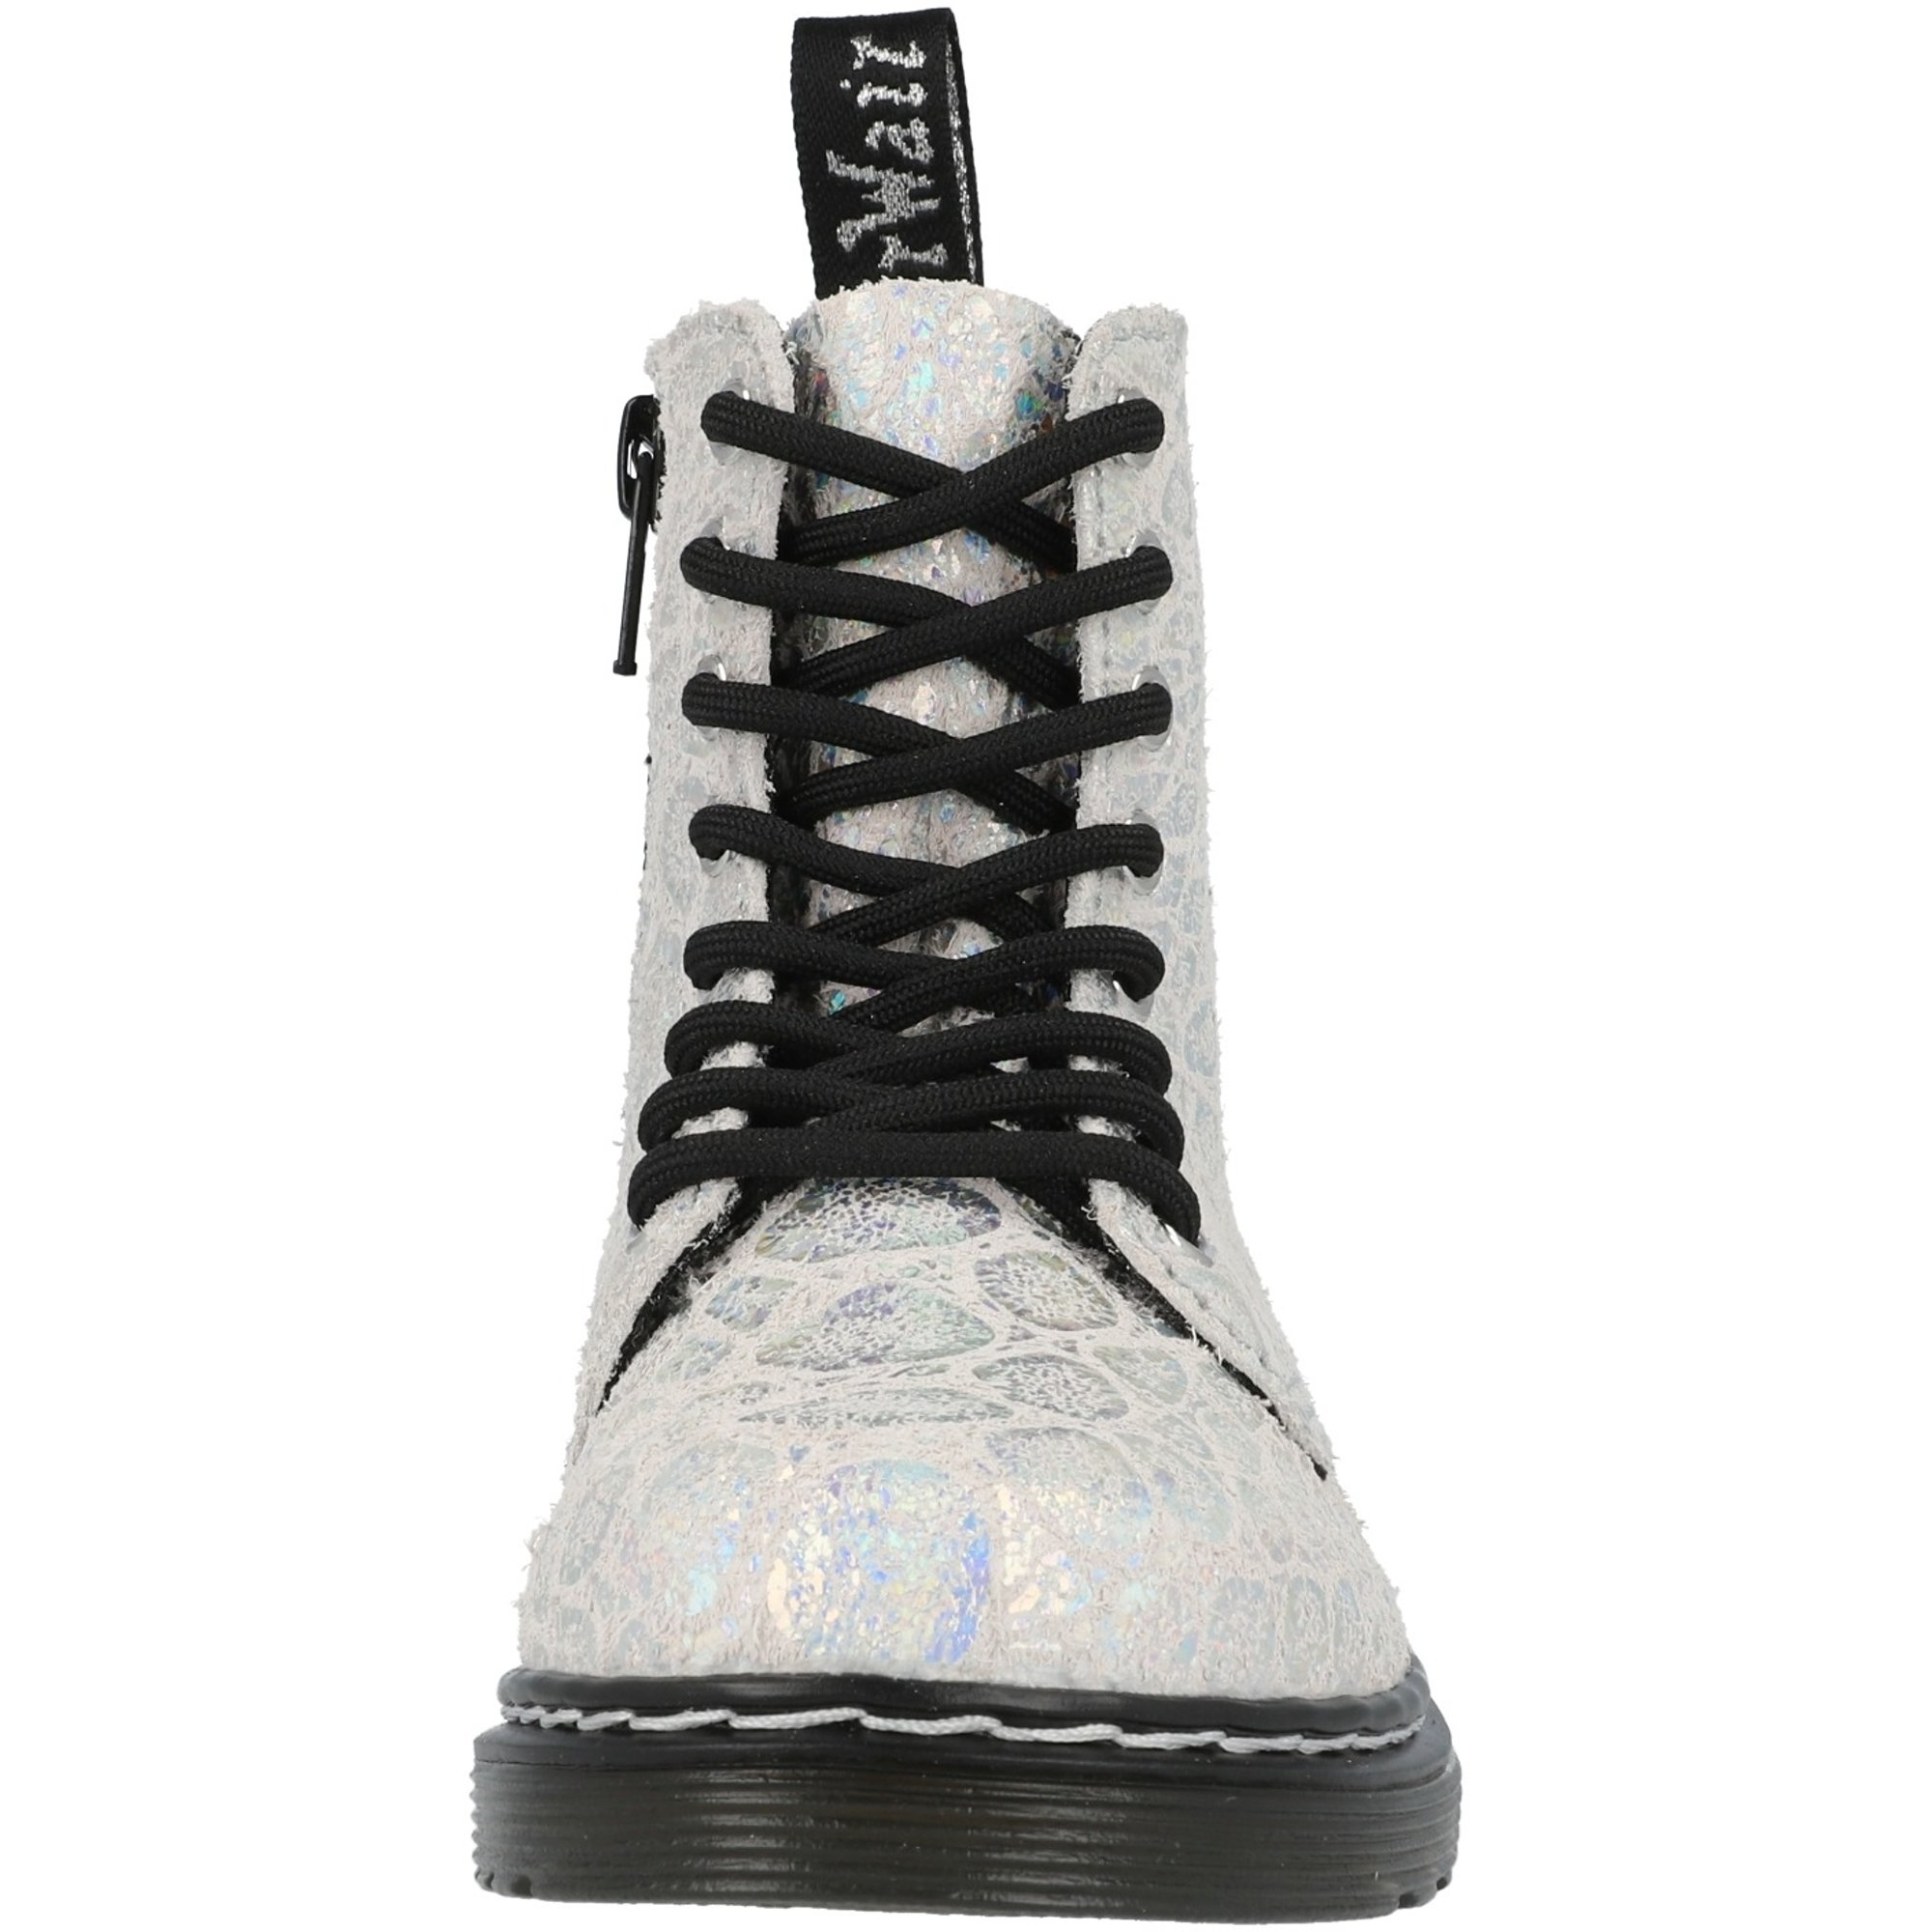 Dr Martens 1460 Pascal J White/Silver Croc Metallic Suede